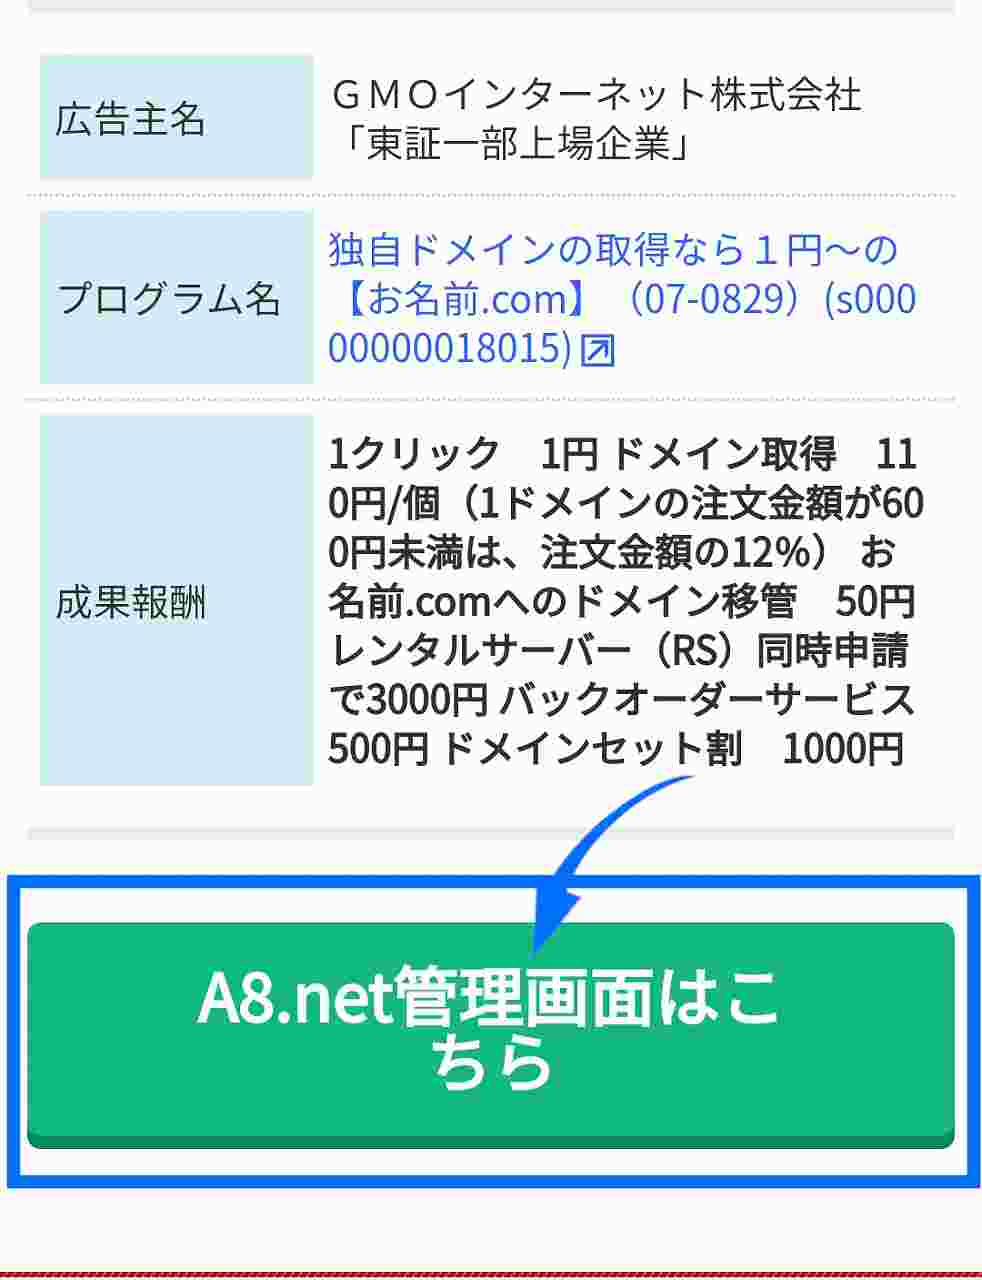 A8.netの登録方法22A8.netへの本登録の完了画面からA8.netの管理画面へ